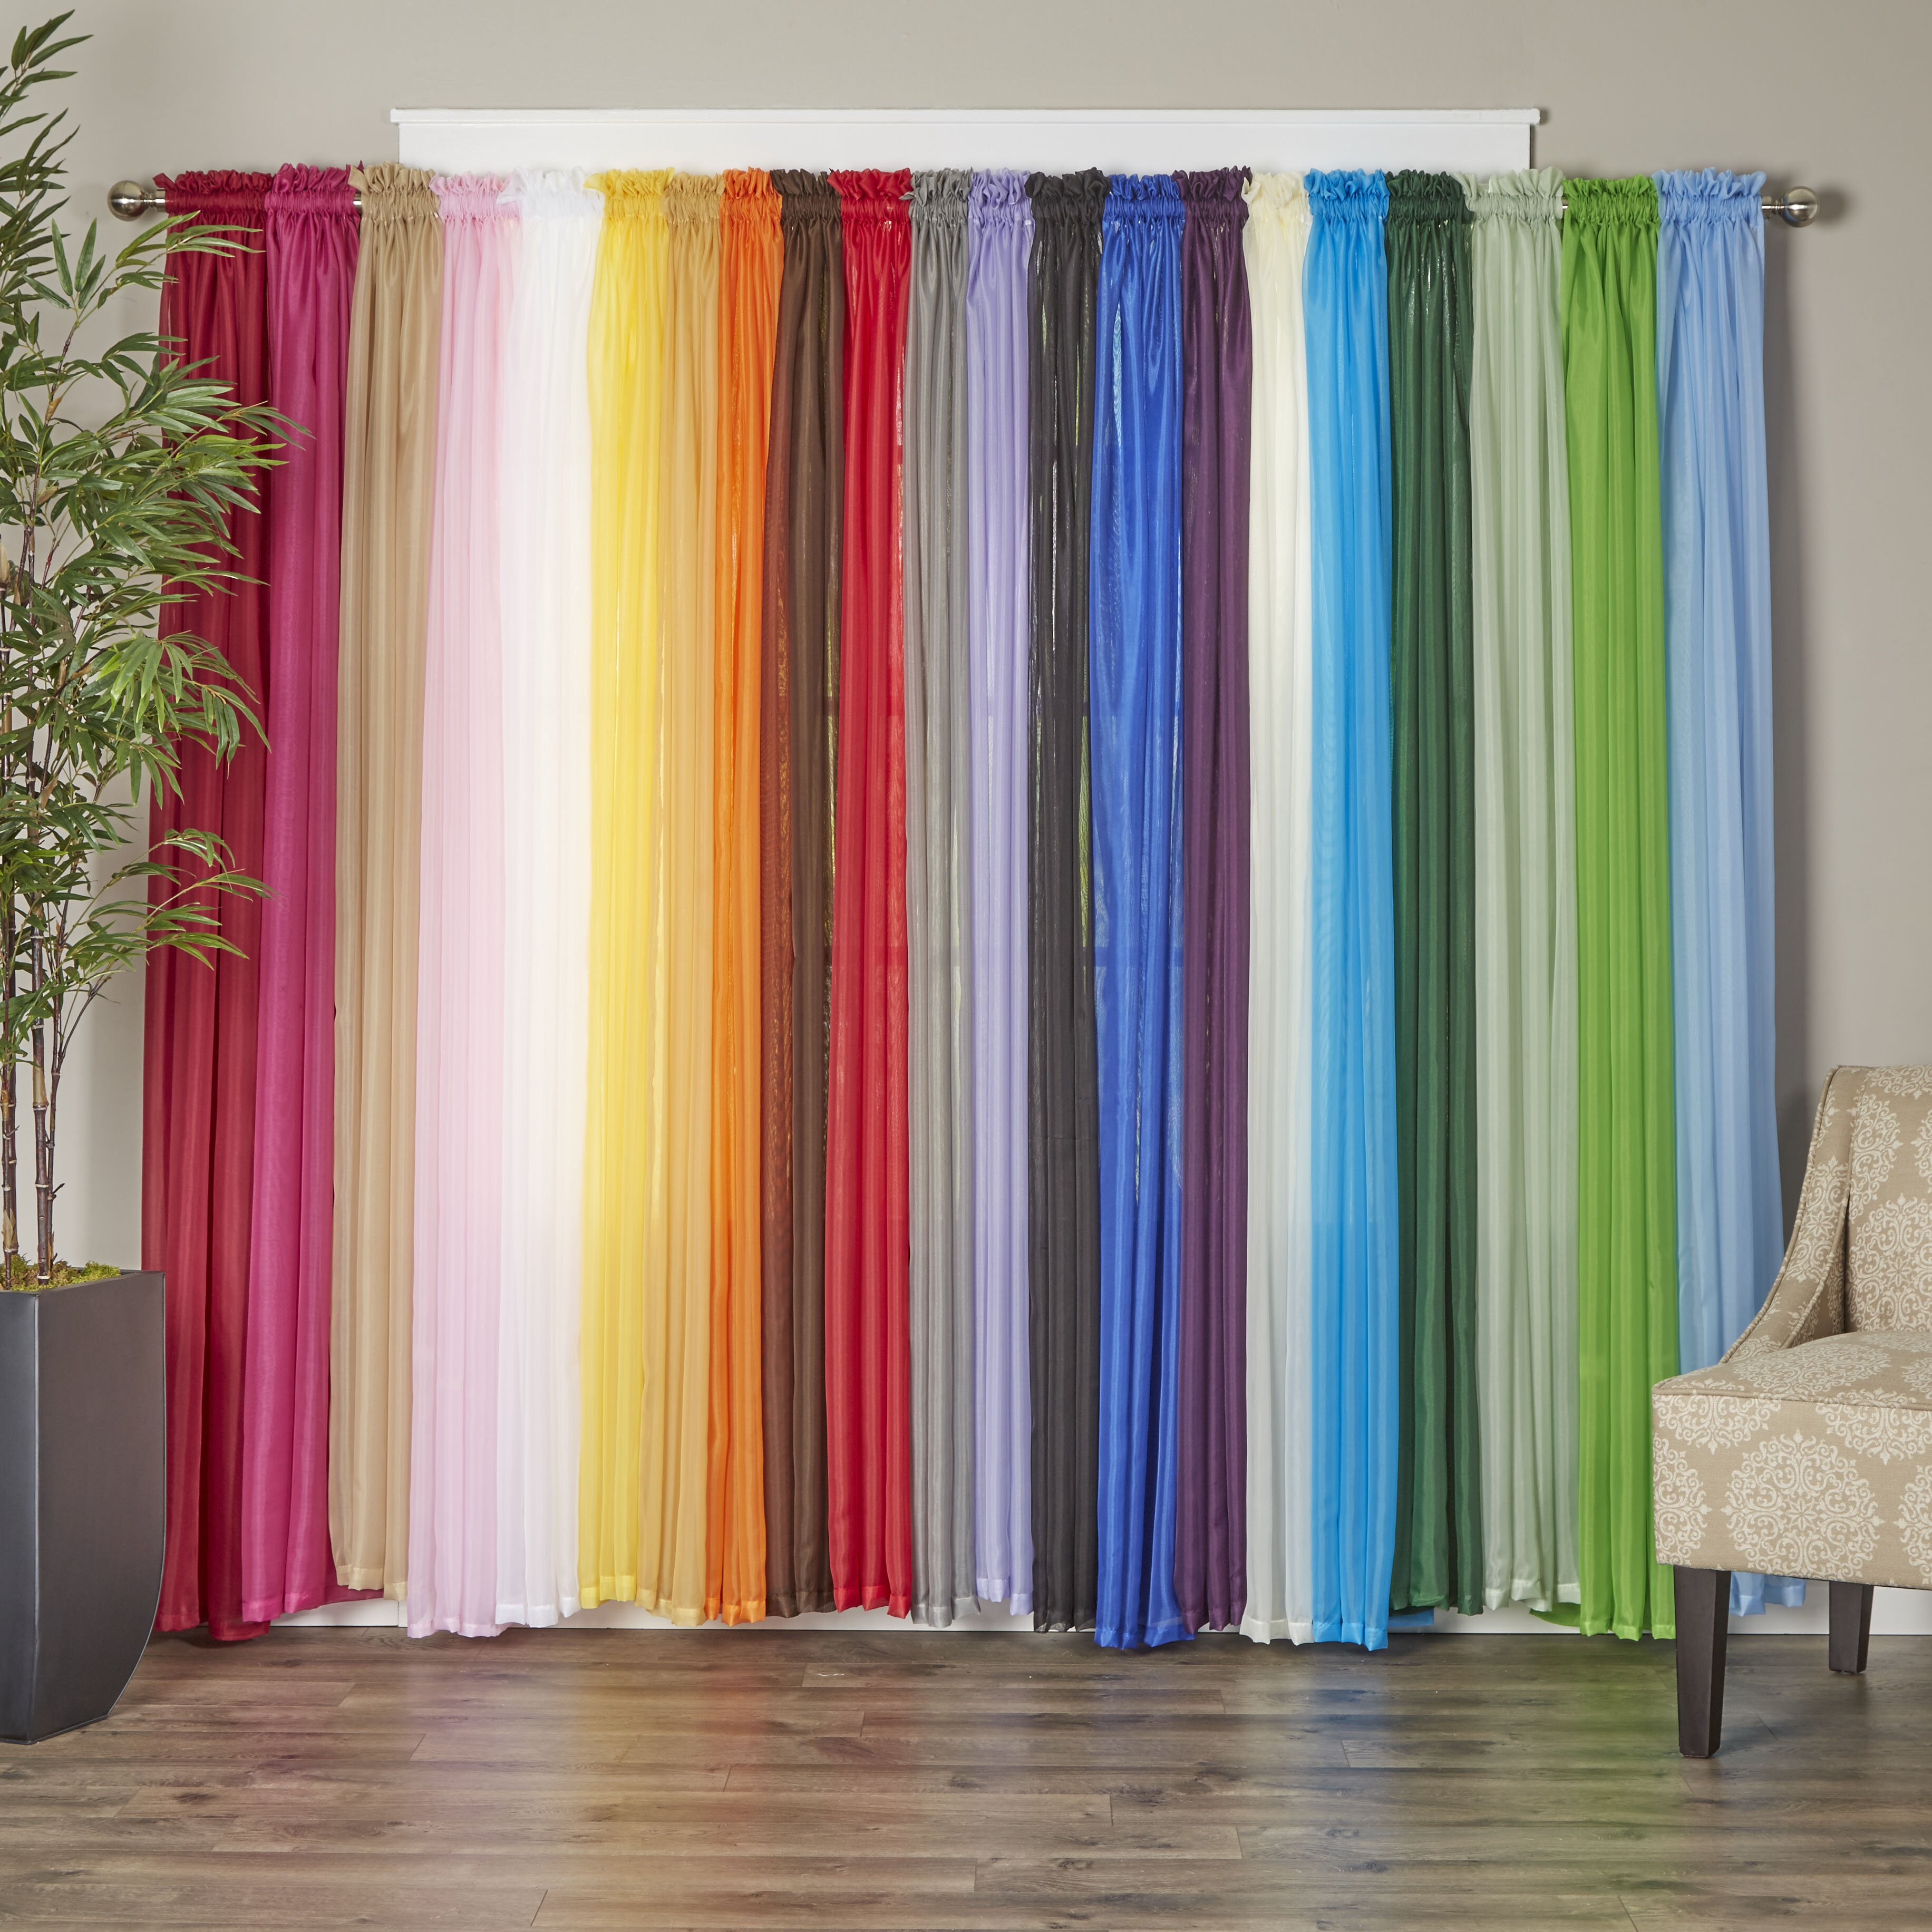 Polyester Curtain Panels : Wayfair basics polyester curtain panel